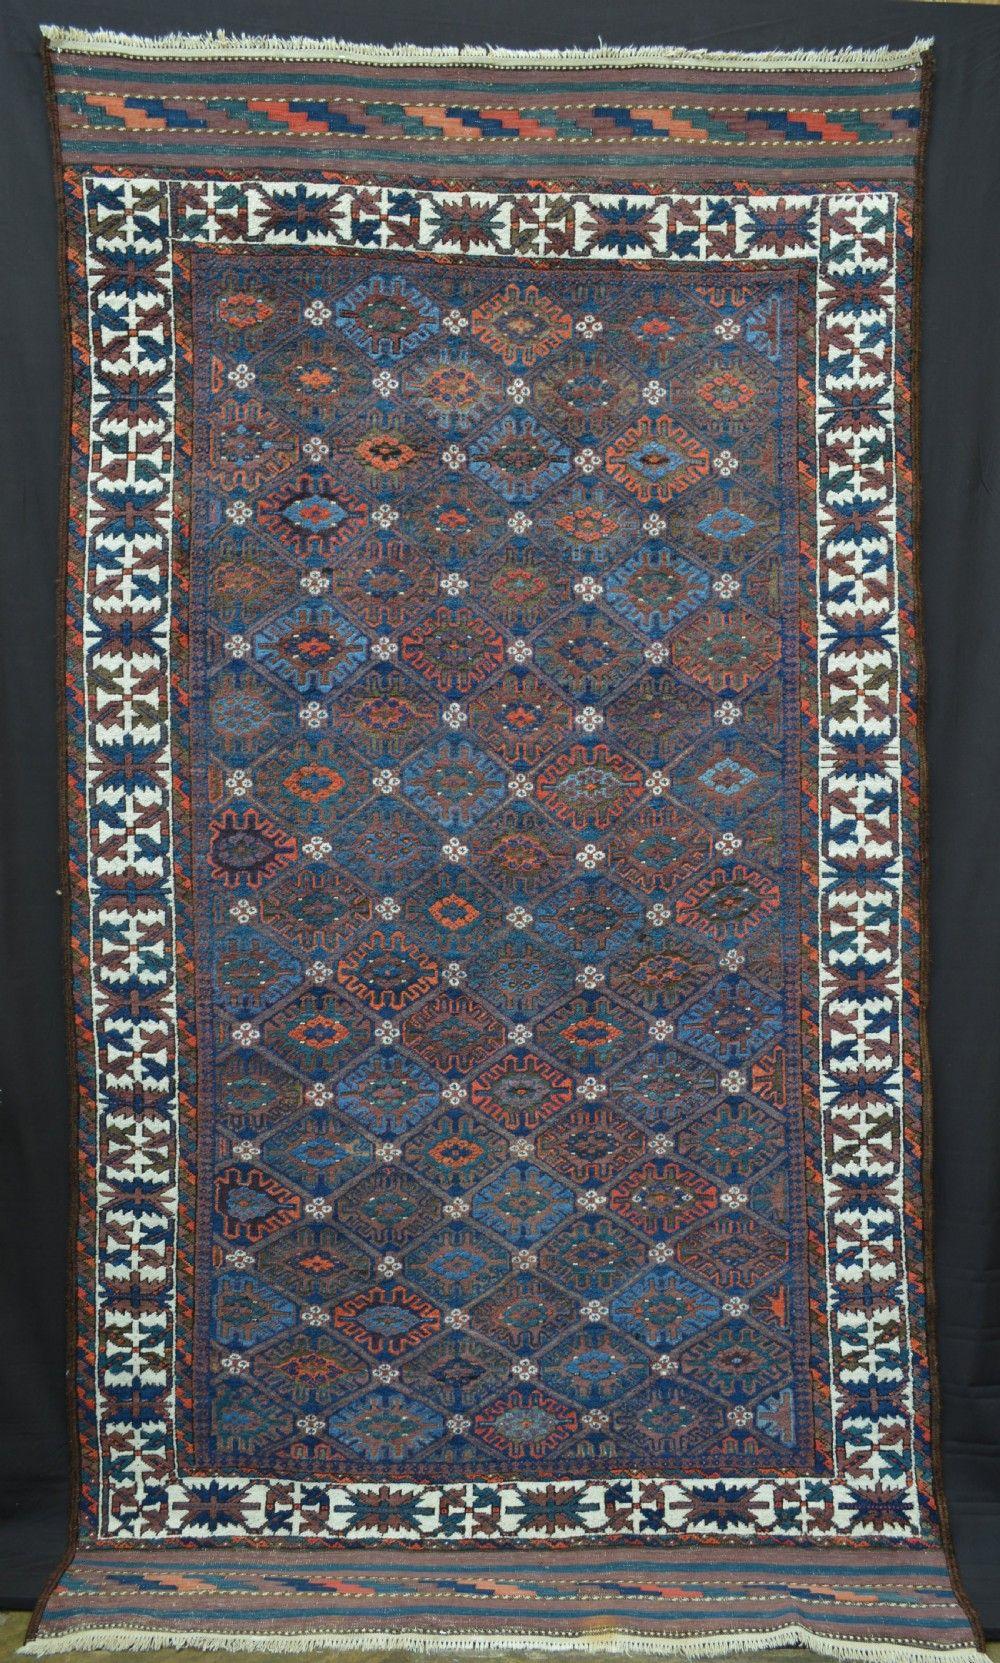 Baluch Tribal Rug Khorassan Province North East Persia 487288 Www Brianmacdonaldantiquerugs Co Uk Tribal Rug Rugs Rugs On Carpet